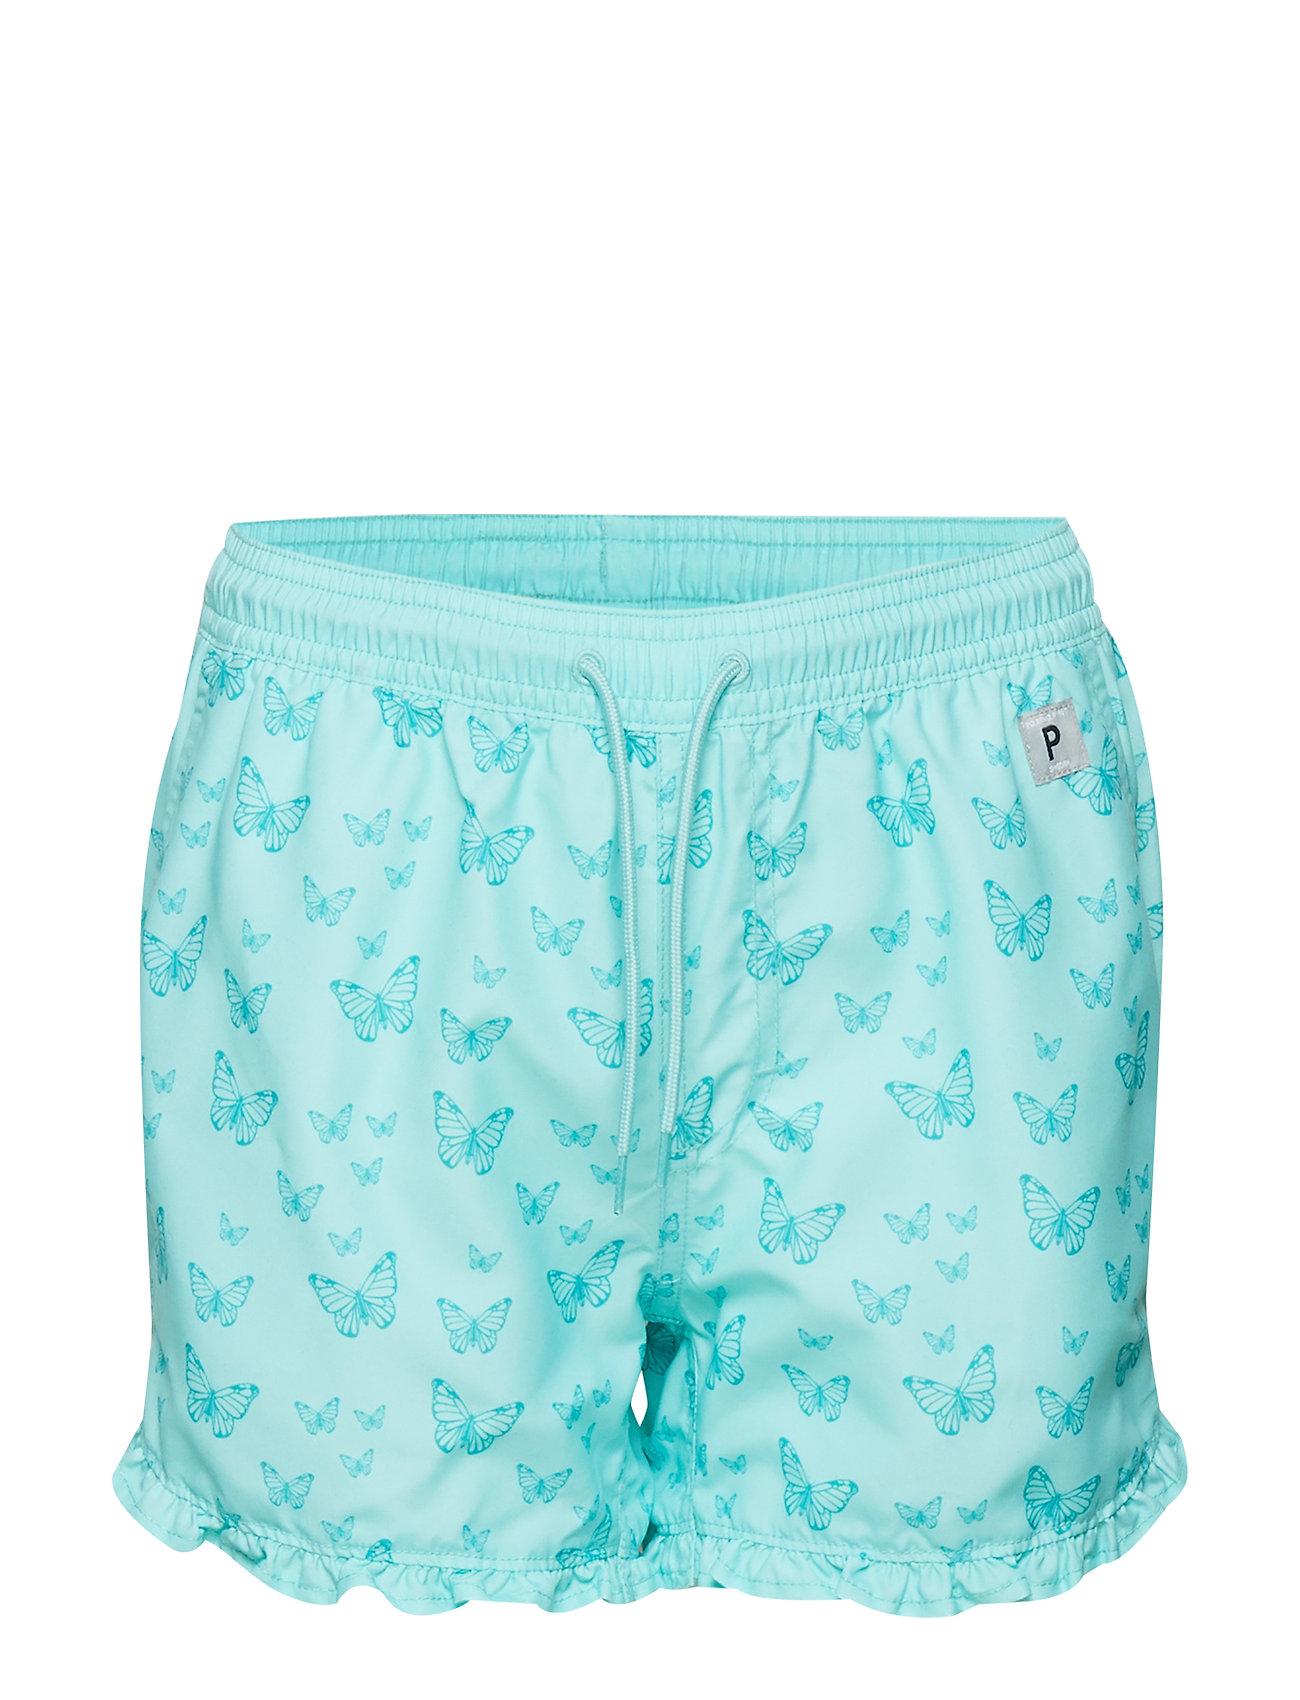 Polarn O. Pyret Swimwear Pants Solid - AQUA HAZE